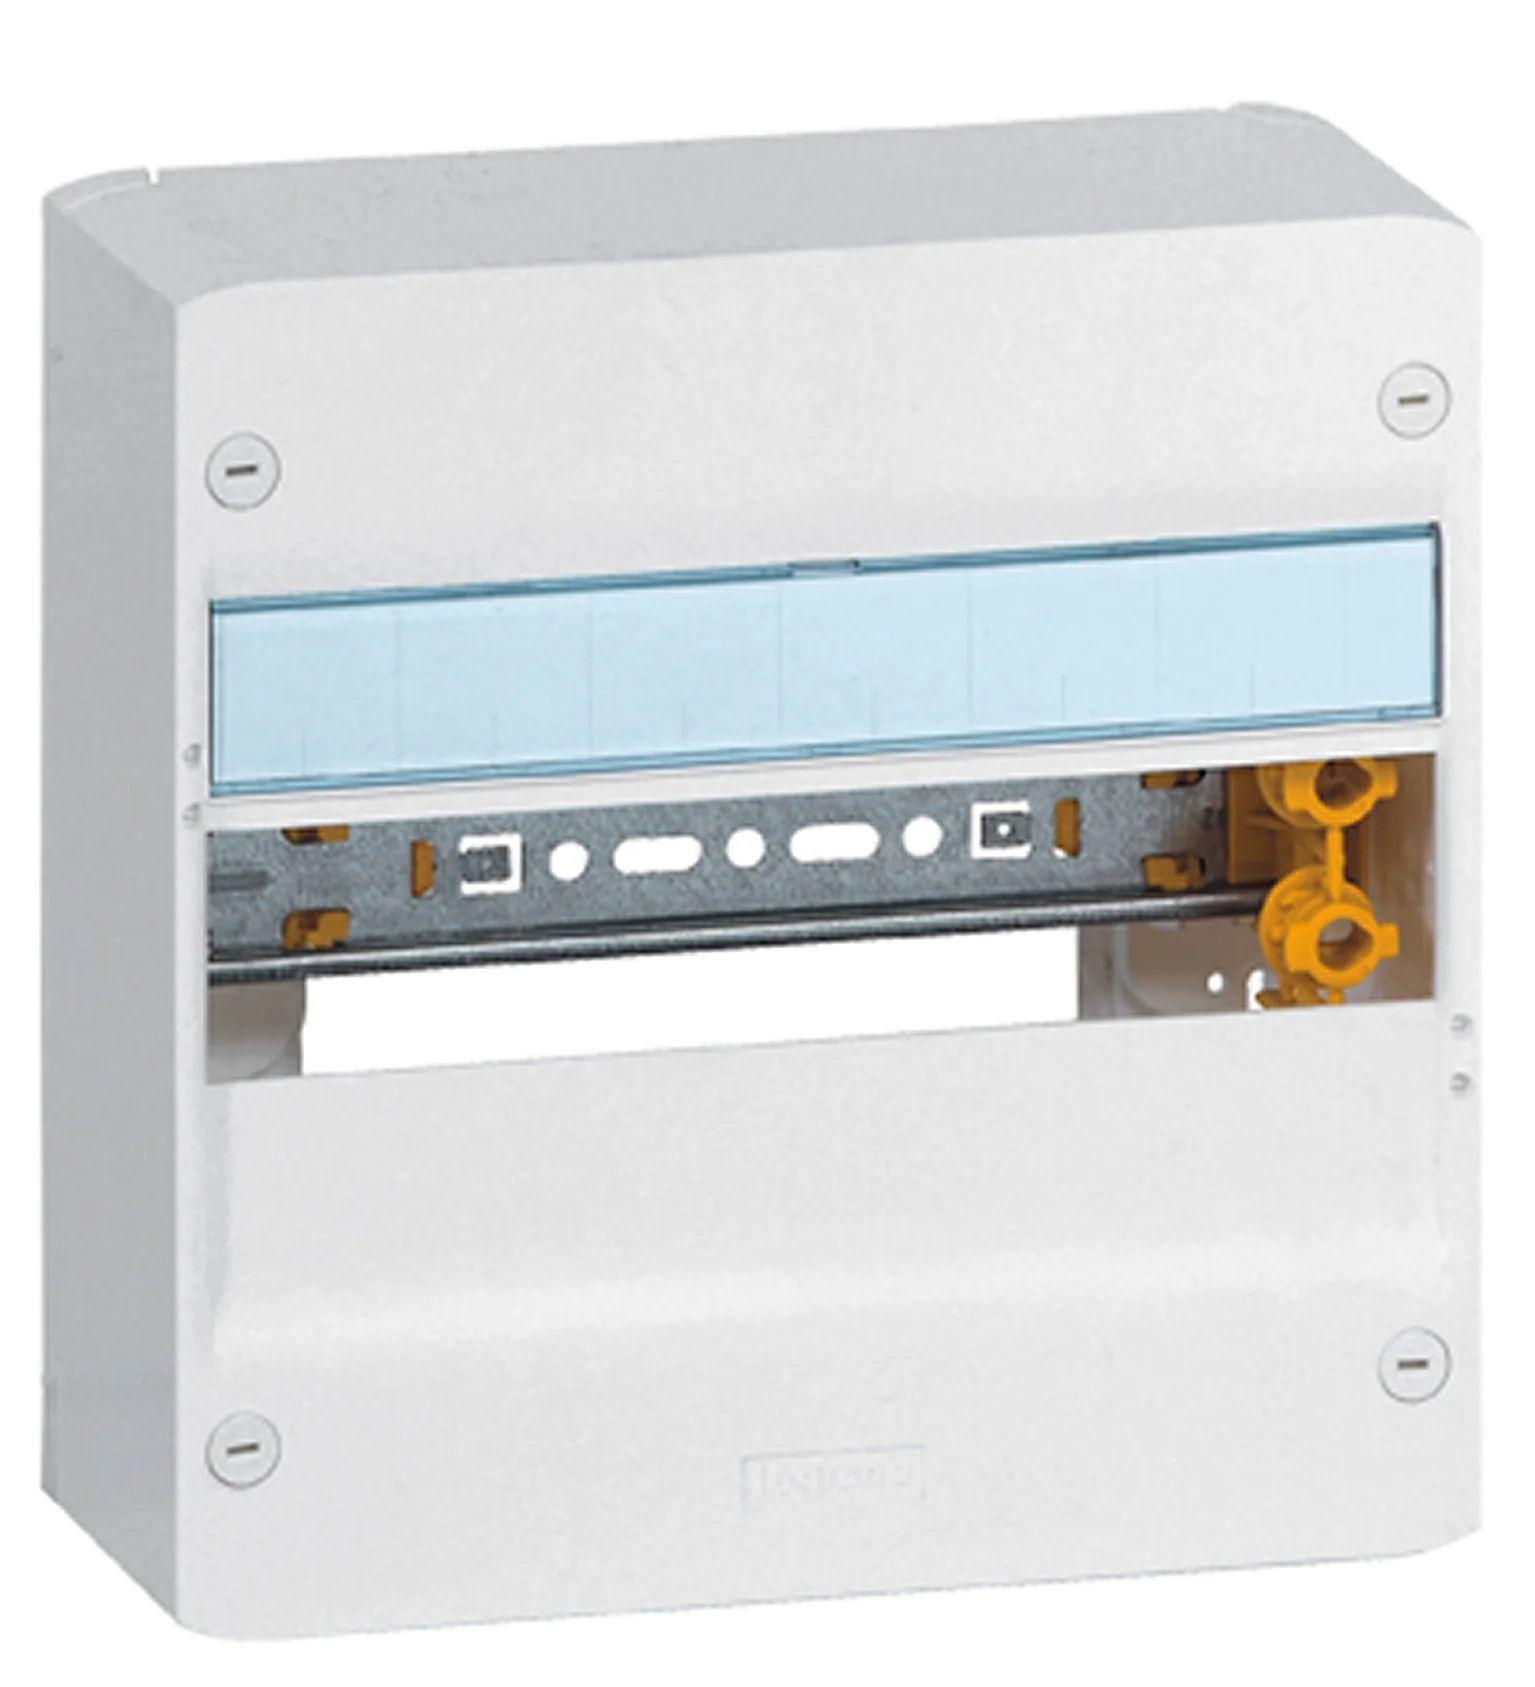 Tableau Electrique Nu Legrand 1 Rangee 13 Modules Leroy Merlin